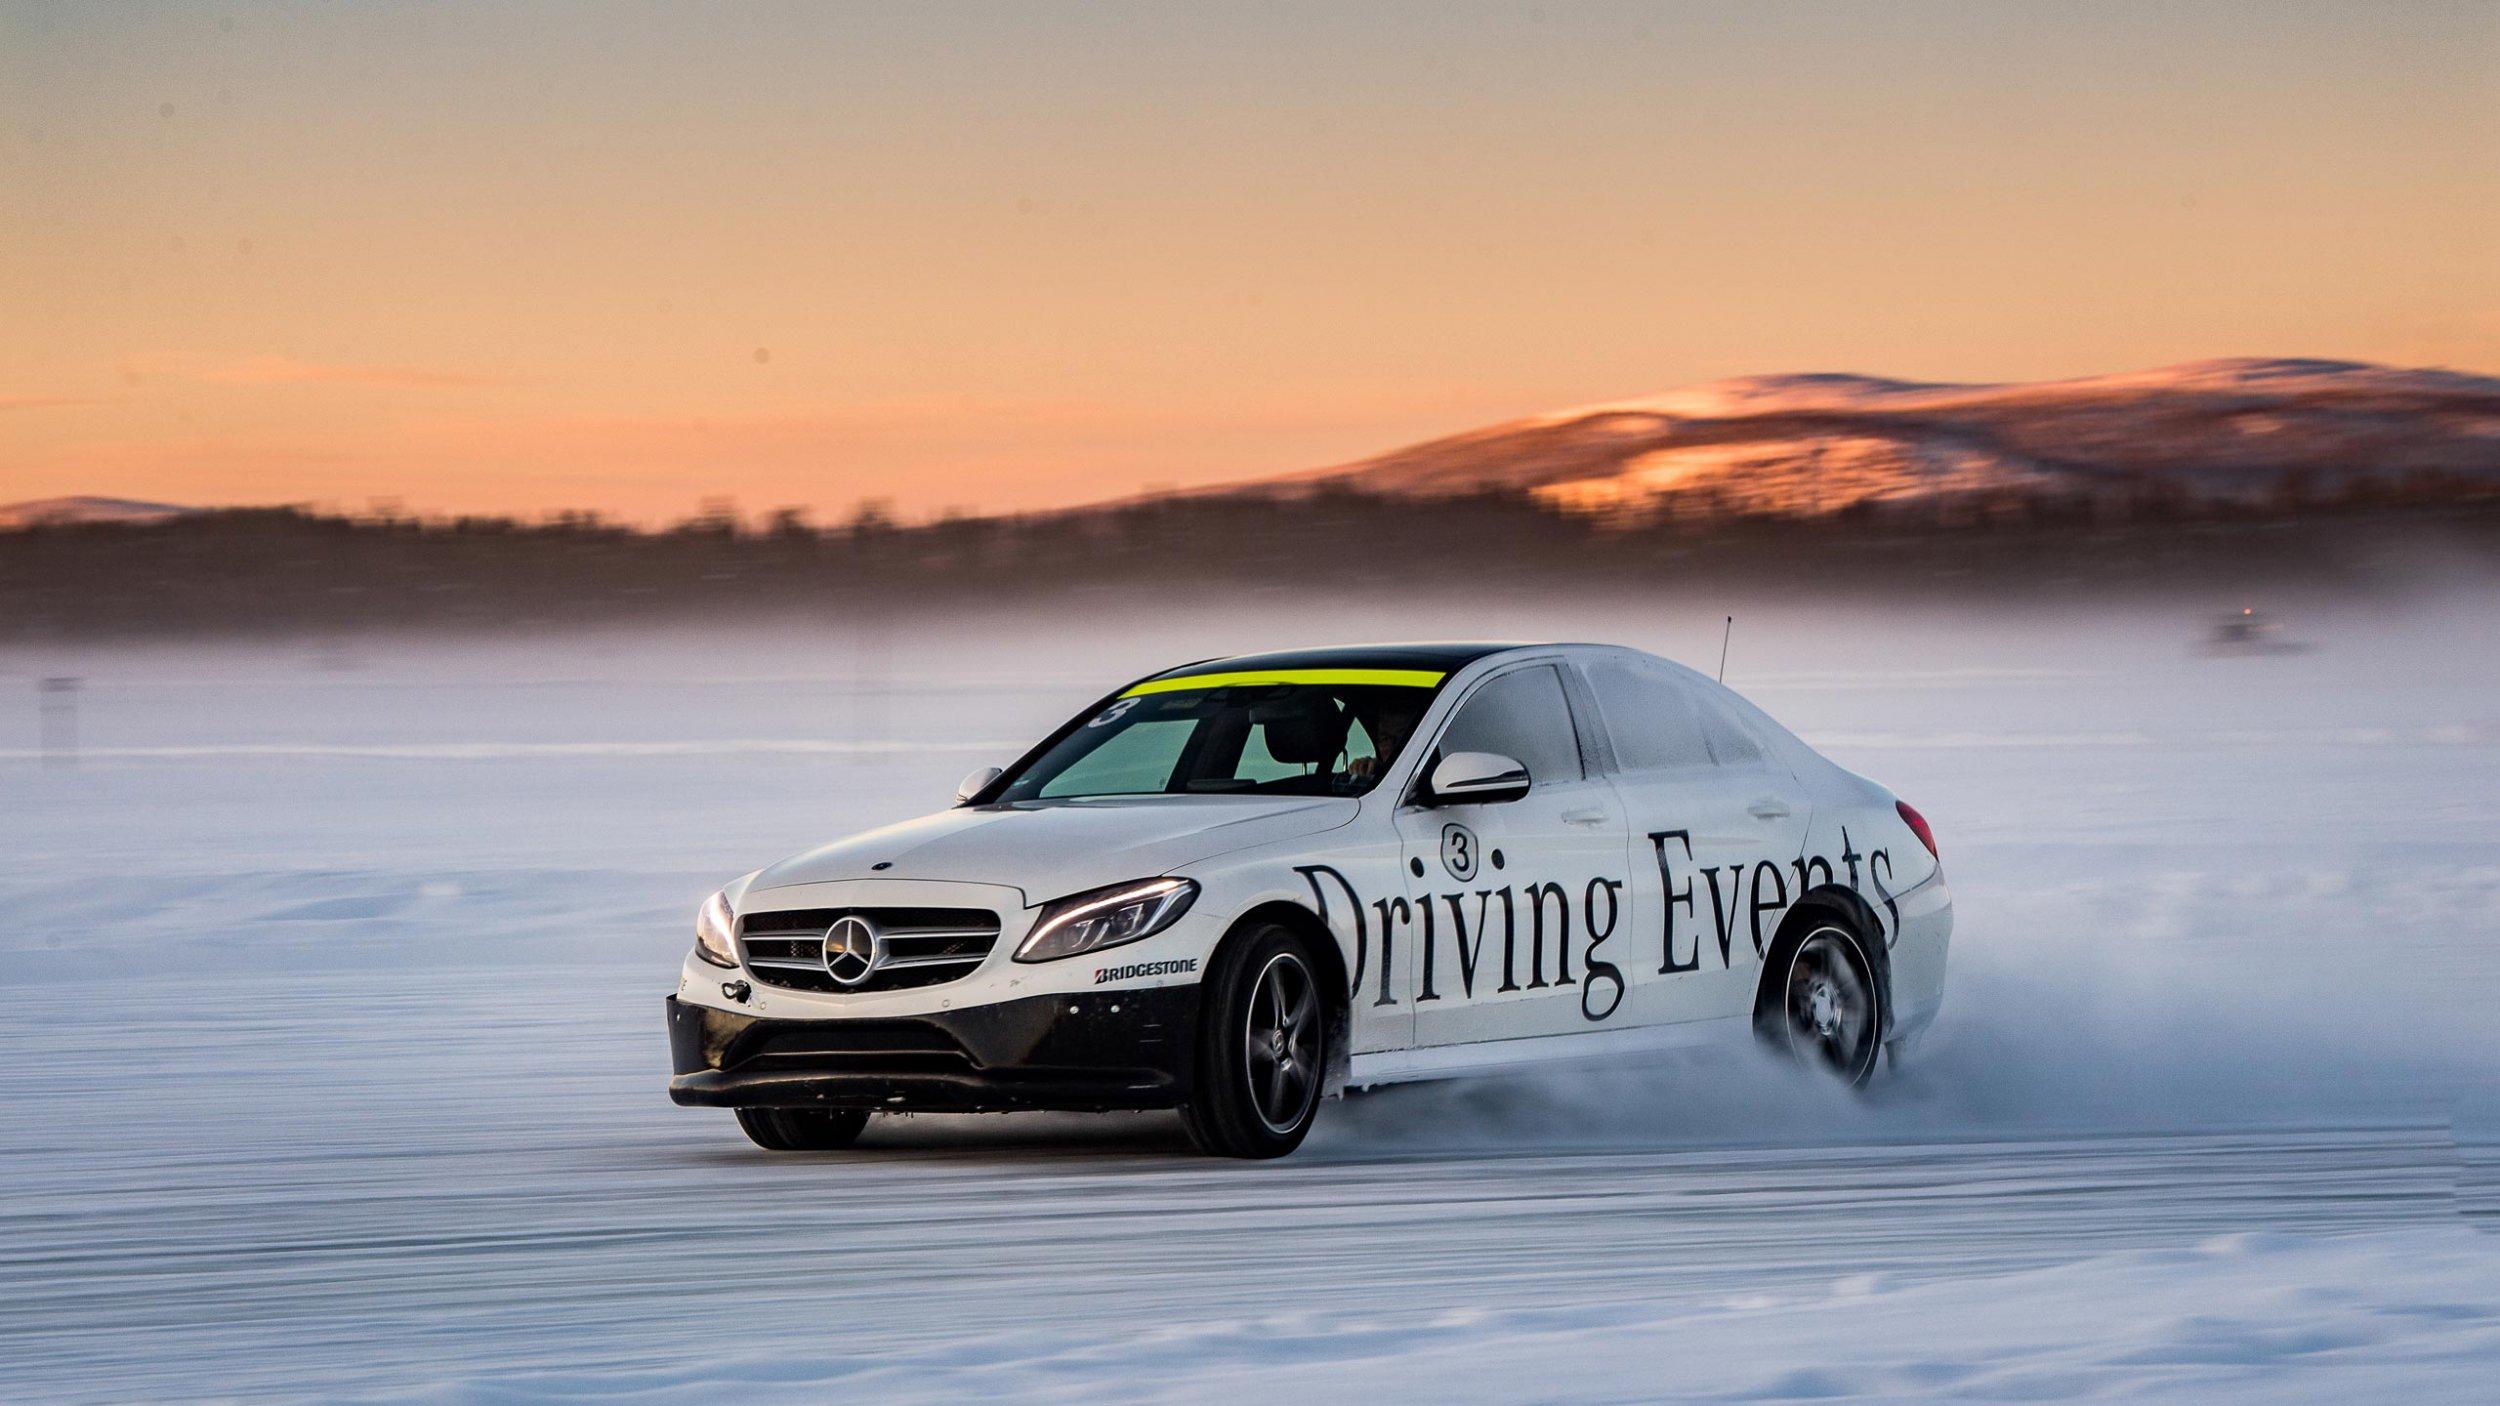 https://cloud.mb-lounge.com/files/HQ-Events/Driving%20Events%20Onroad%20Winter/mbcom_driving-events_WOS_Advanced_2_2560x1440.jpg